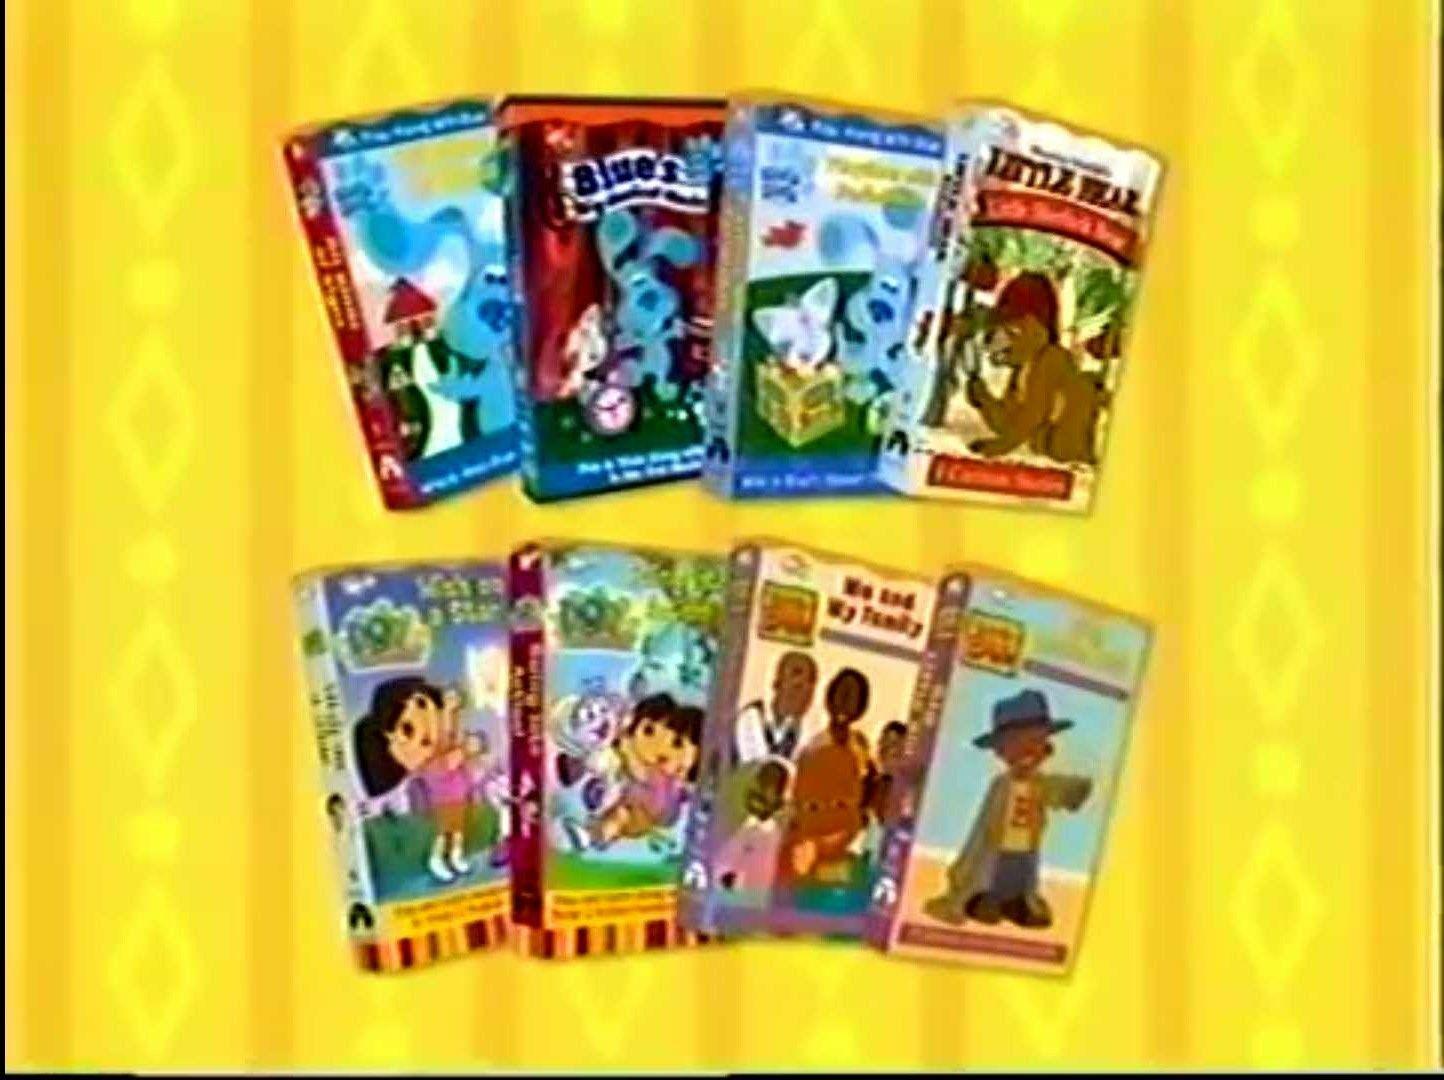 Nick Jr Videos 2001 Preview (Little Bill and Dora the Explorer ...